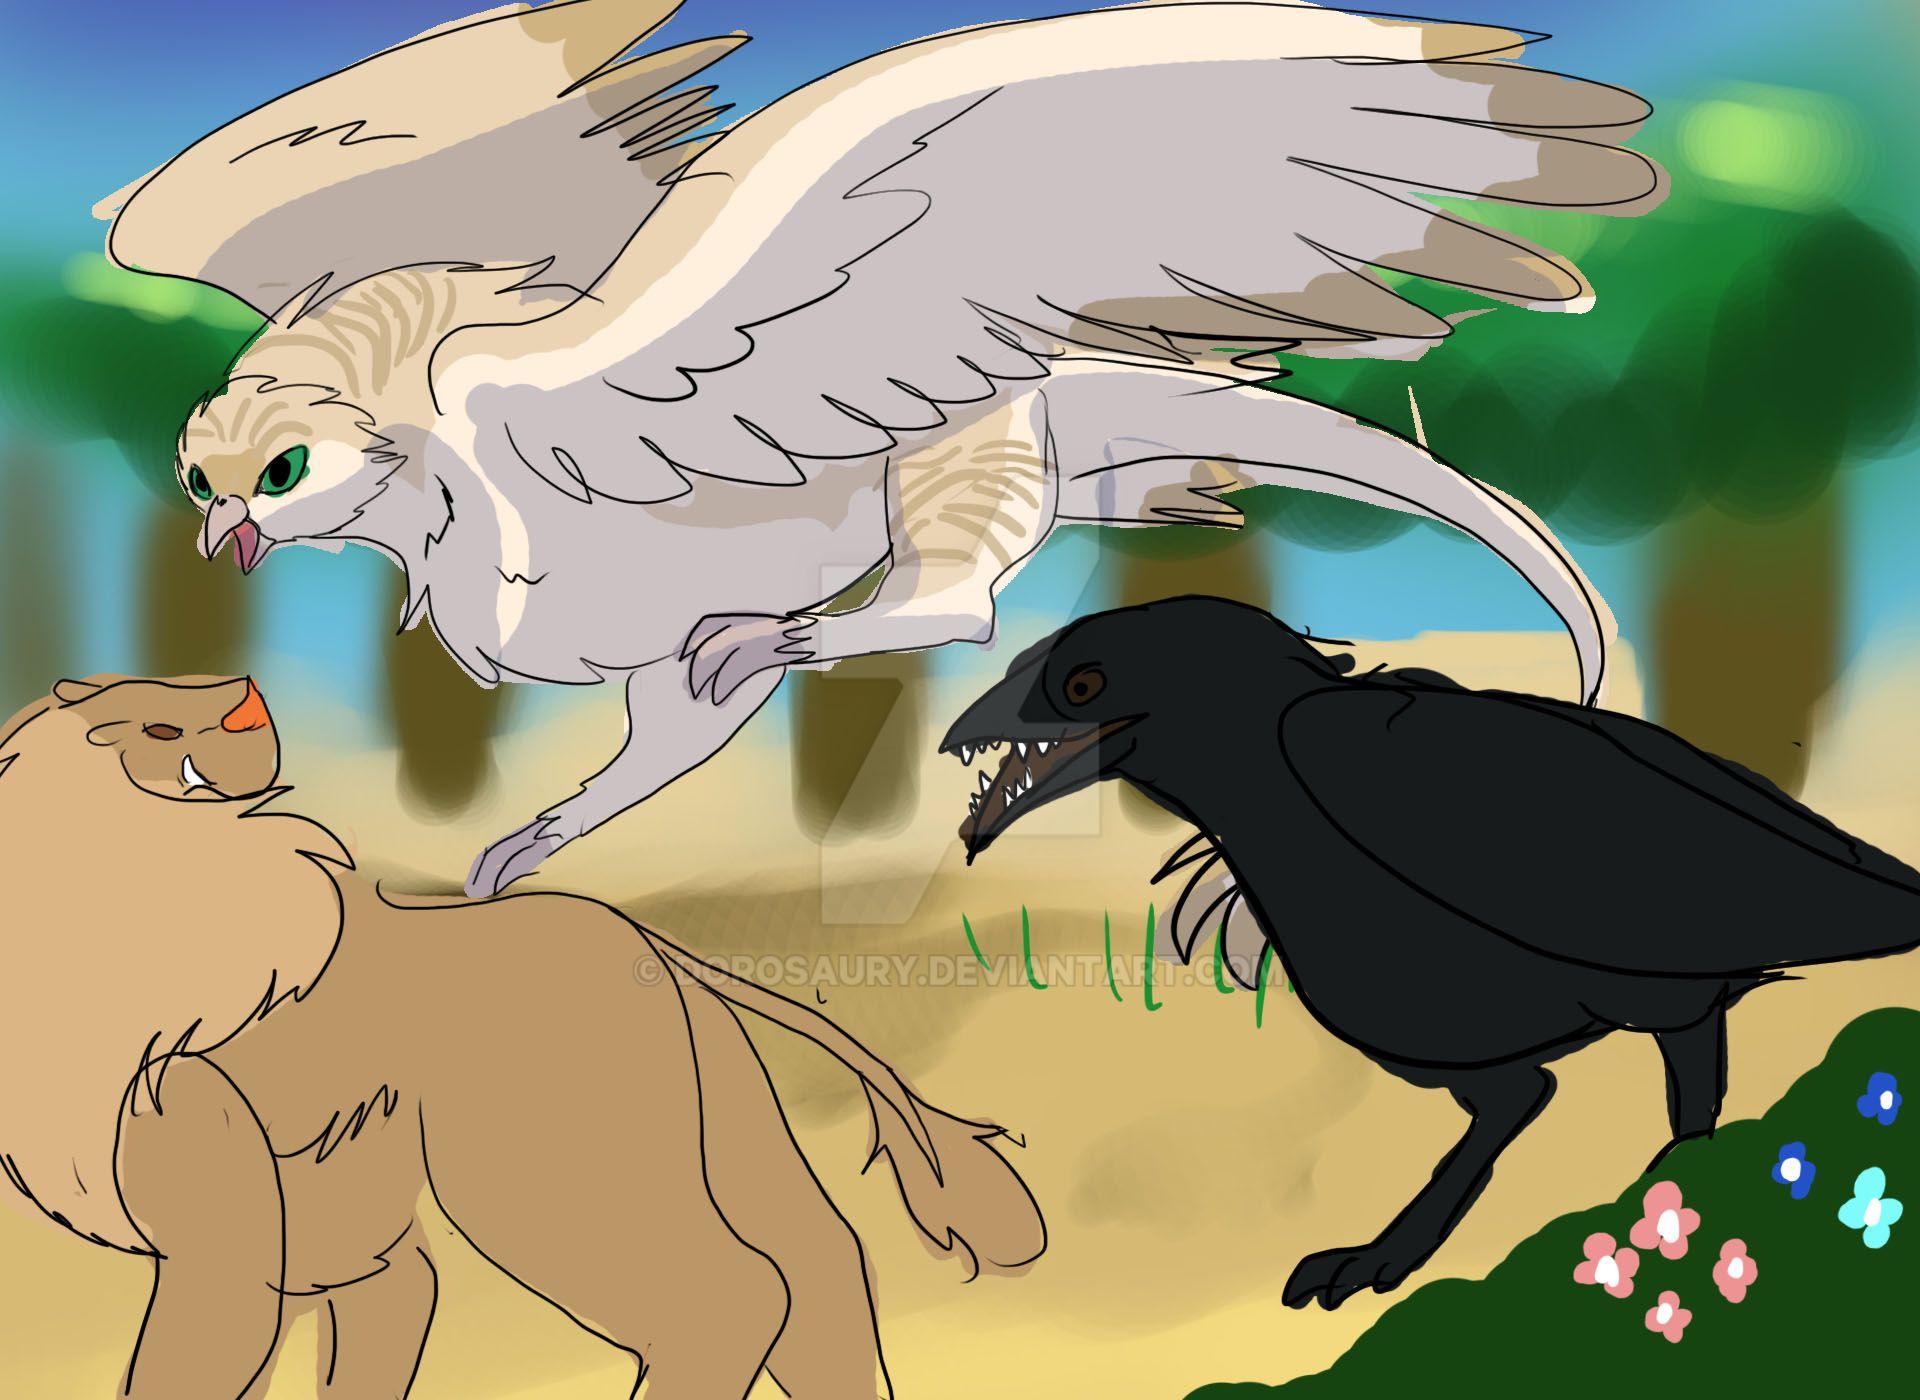 Quick stryx lion hunt by Dorosaury